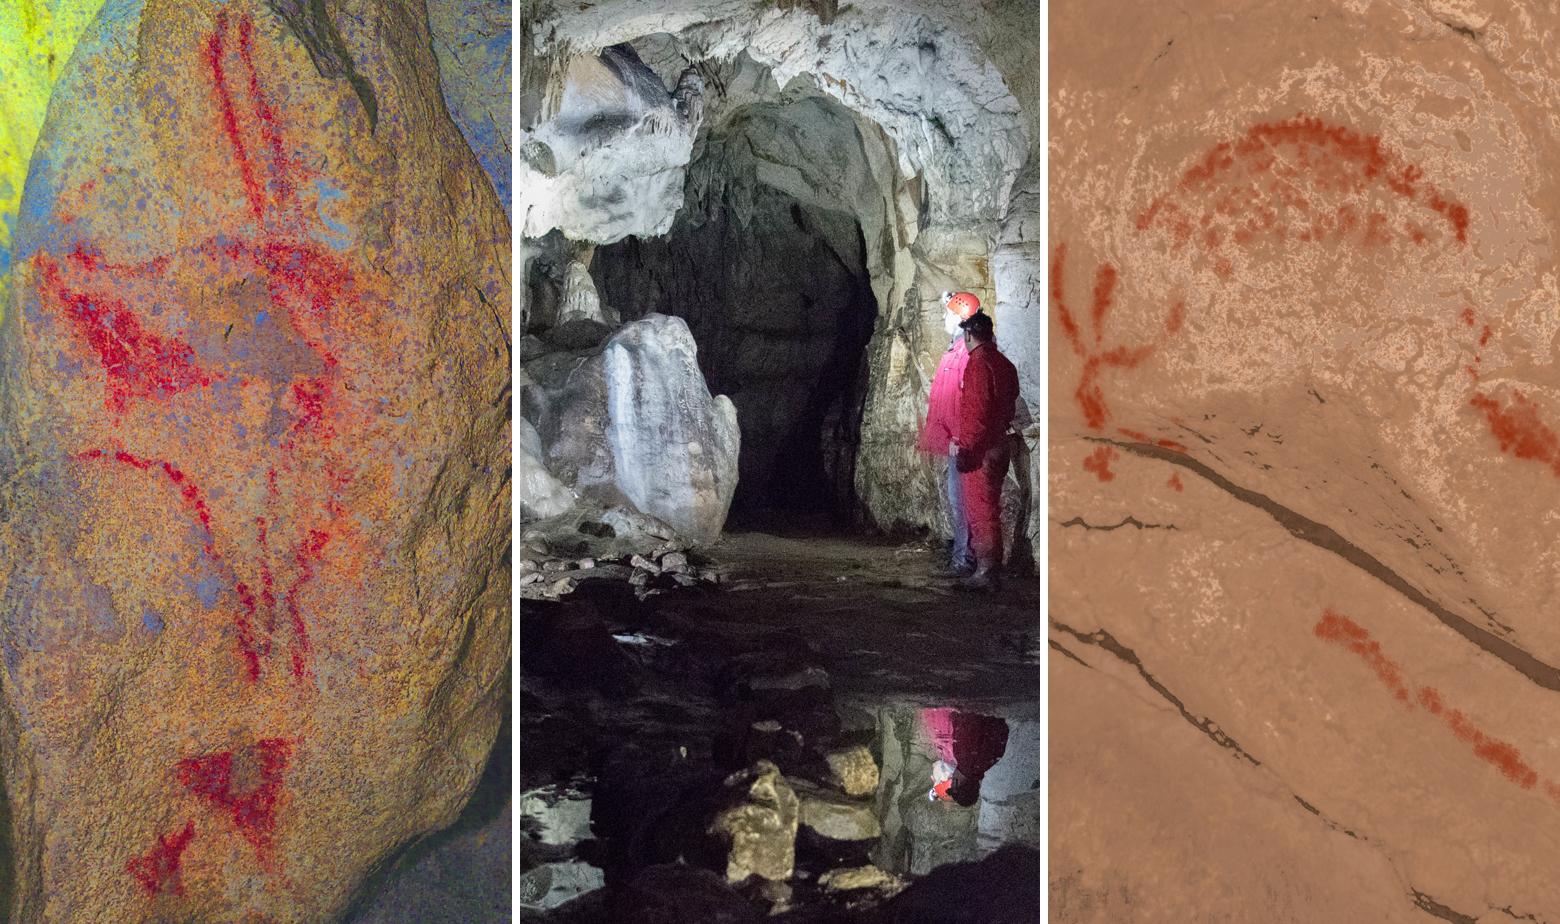 Divokoza i bizon naslikani u Romualdovoj pećini